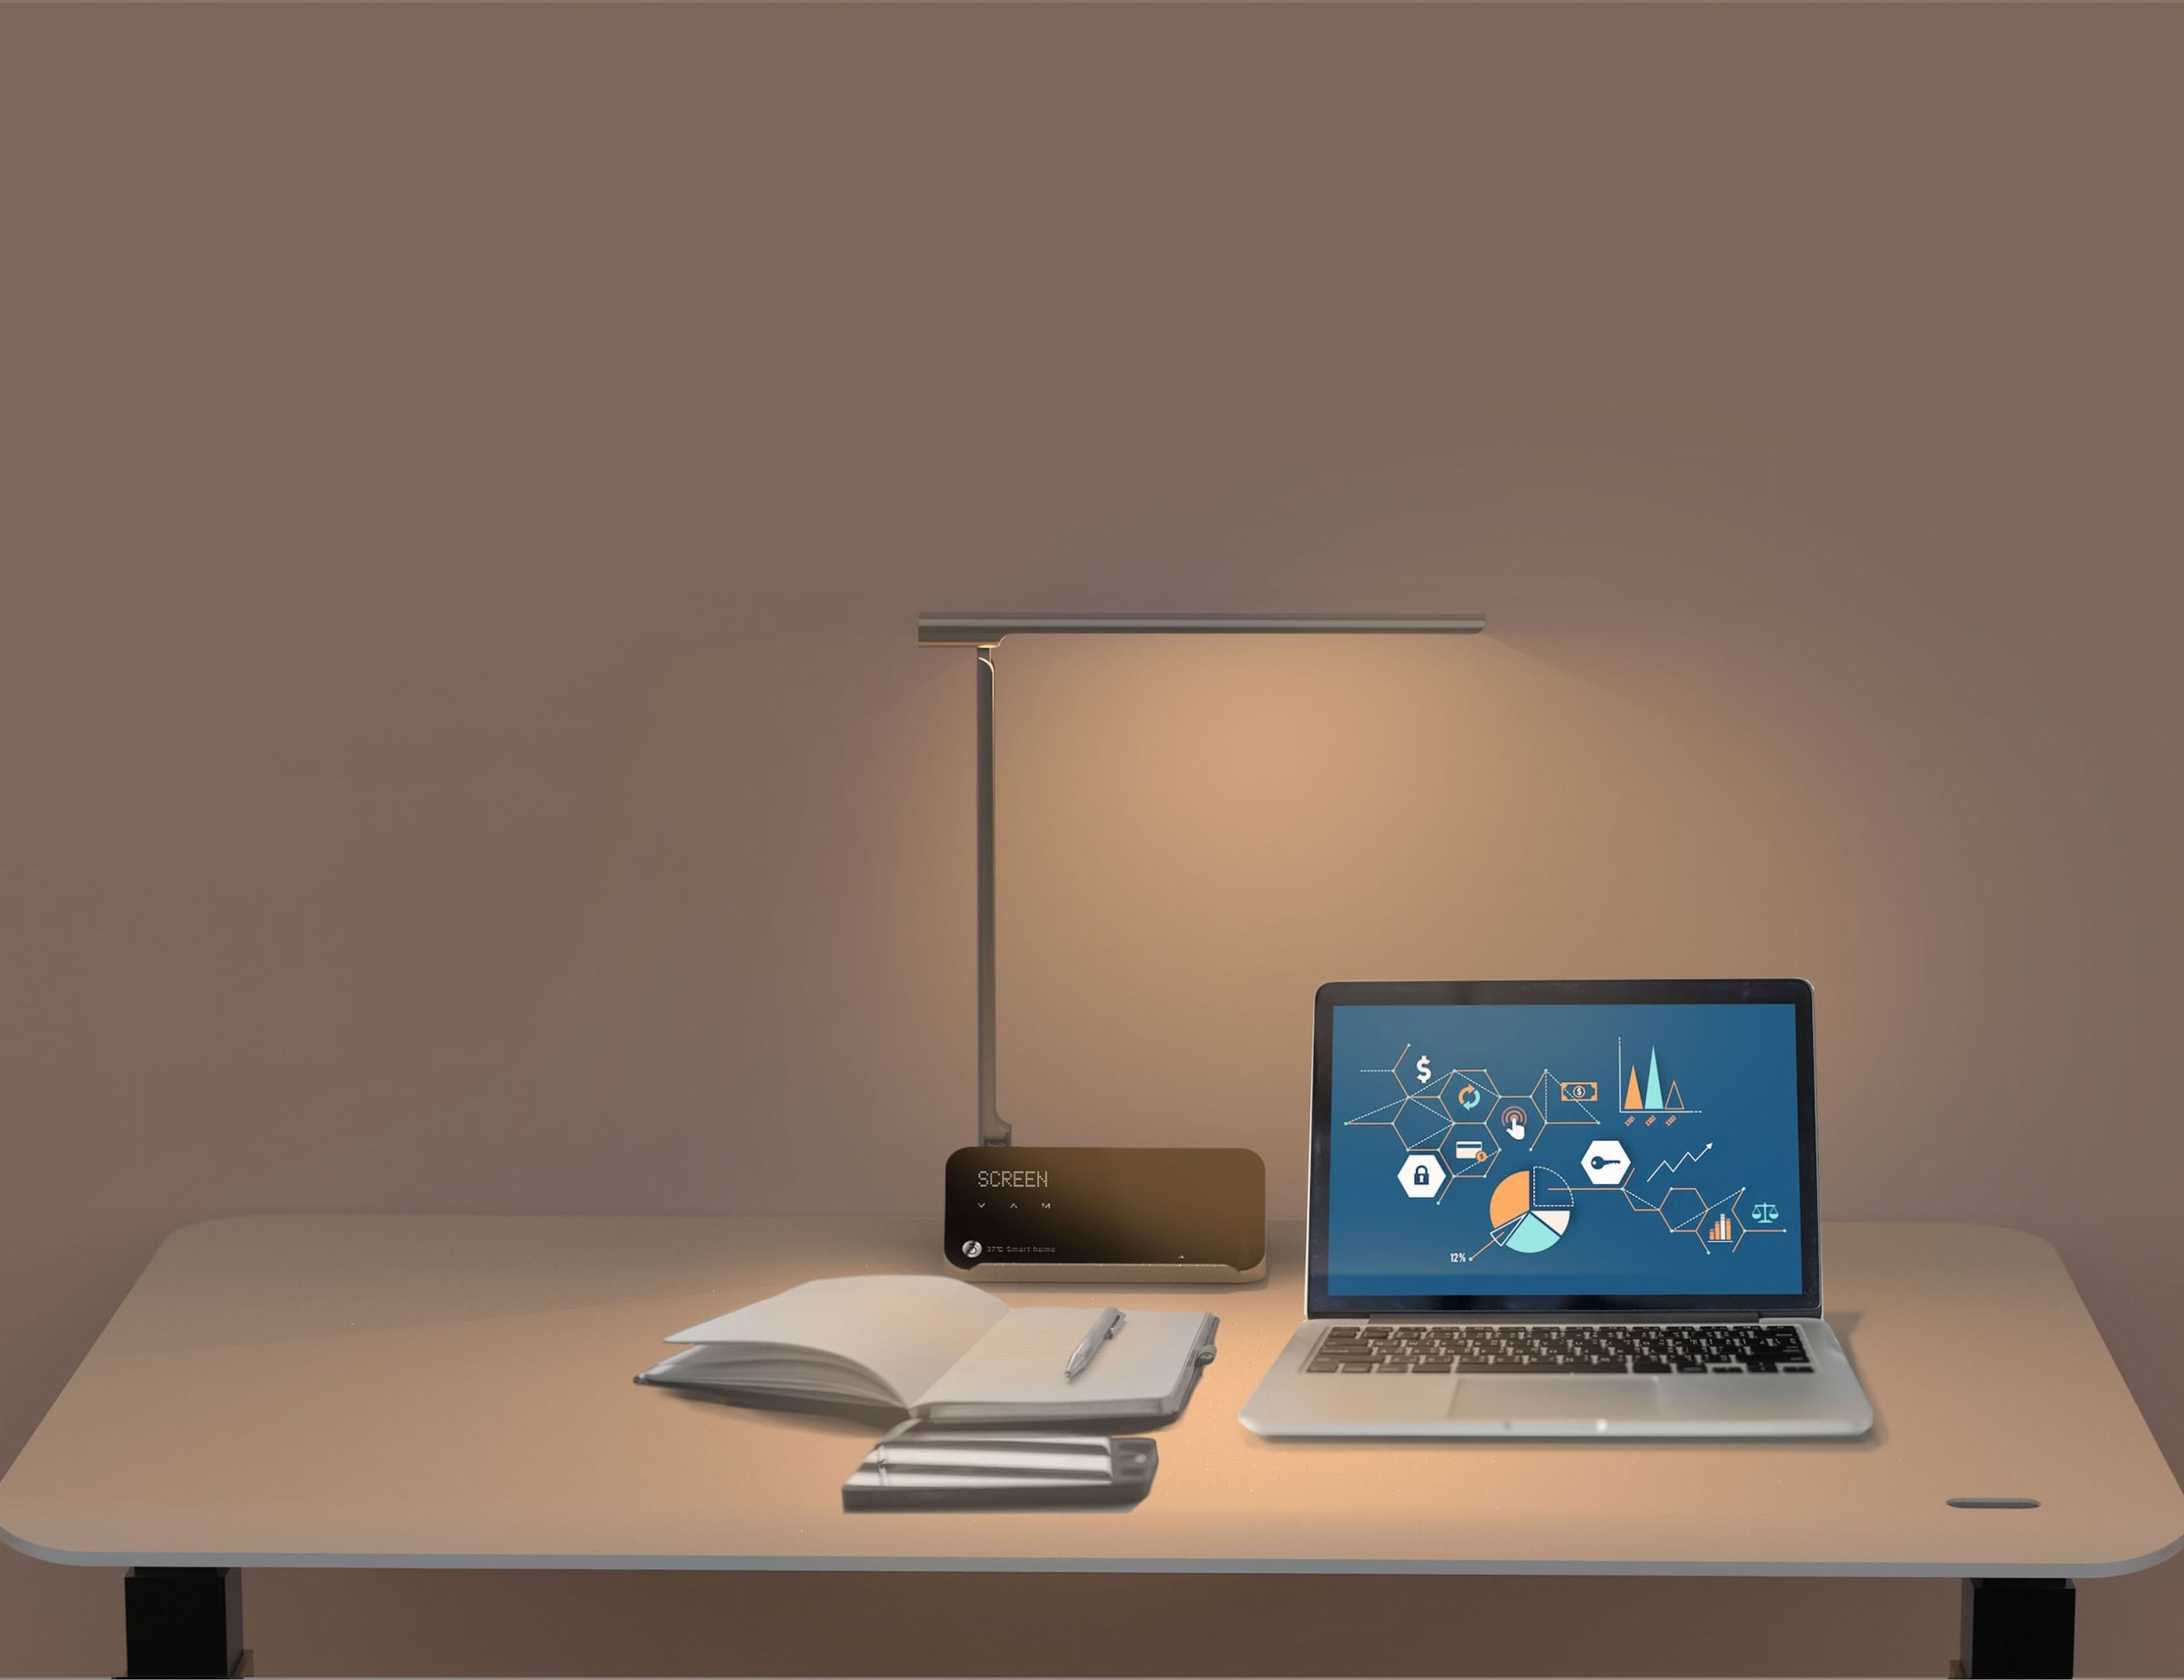 Magic Desk Gesture-Controlled Standing Desk